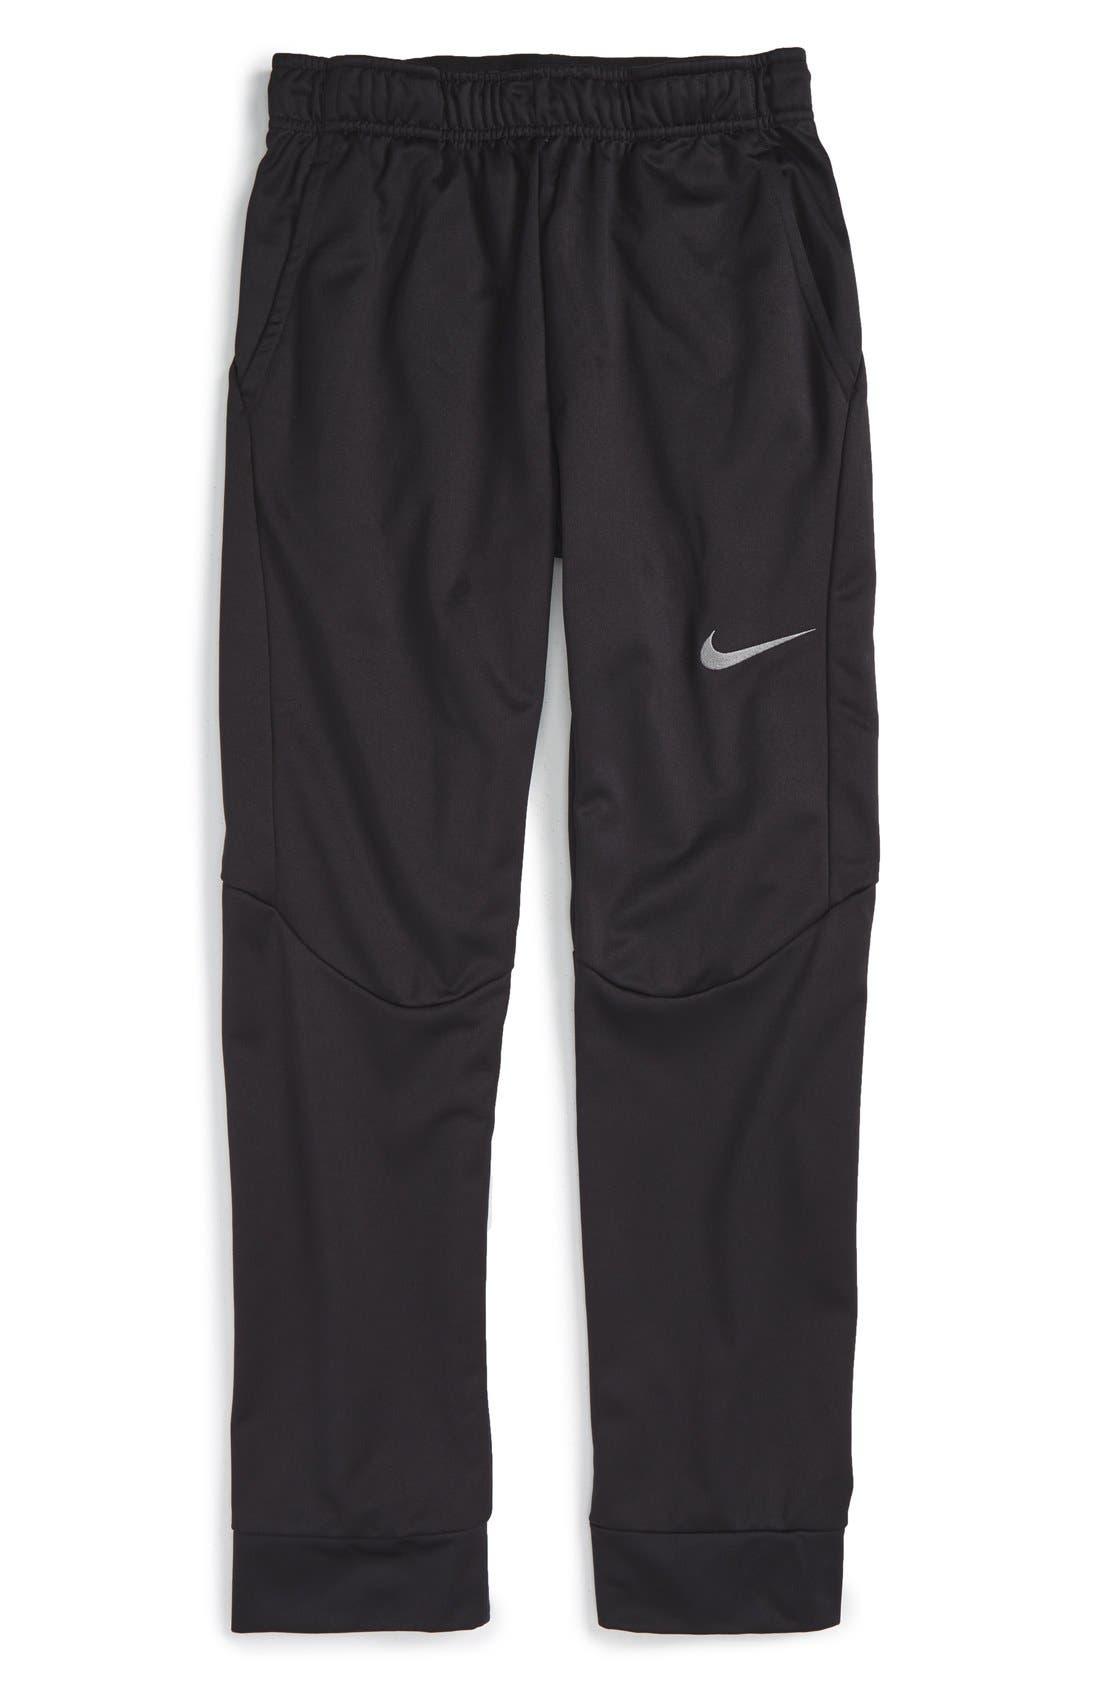 Therma-FIT Tapered Fleece Pants,                         Main,                         color, Black/ Dark Steel Grey